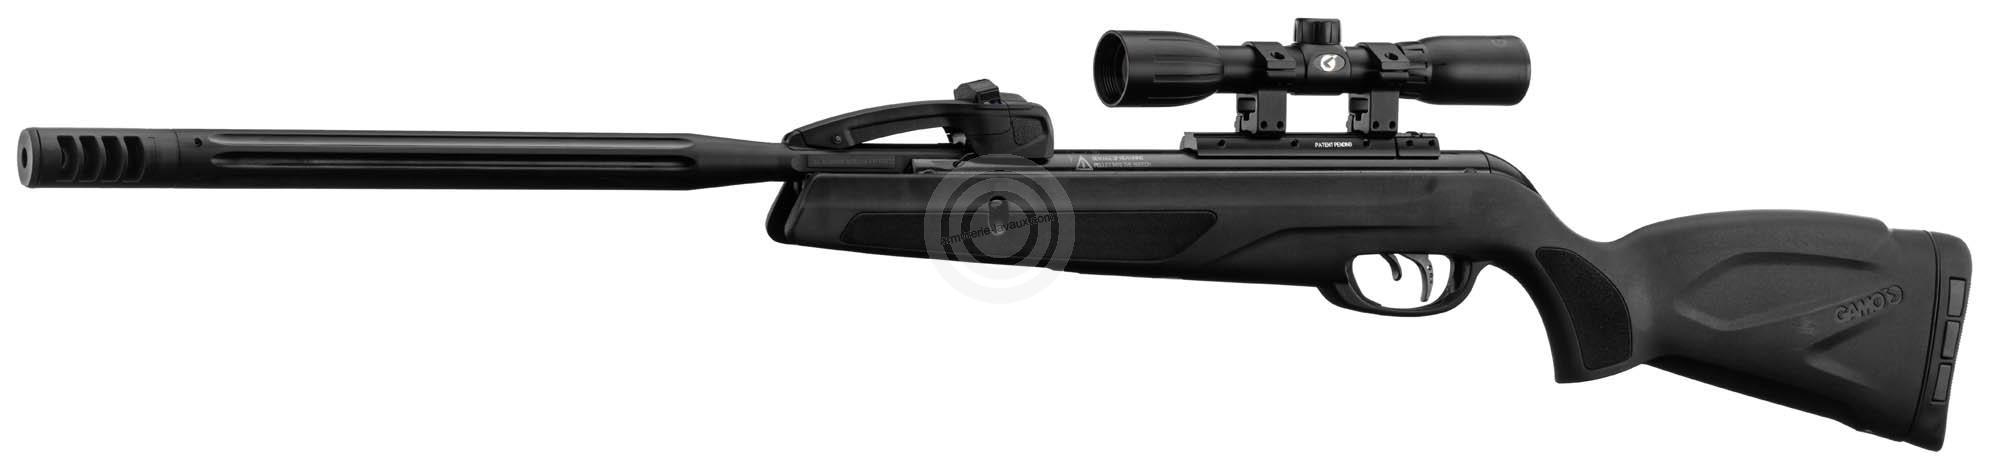 Carabine GAMO REPLAY 10 Maxxim Combo 4x32 (chargeur 10 coups)